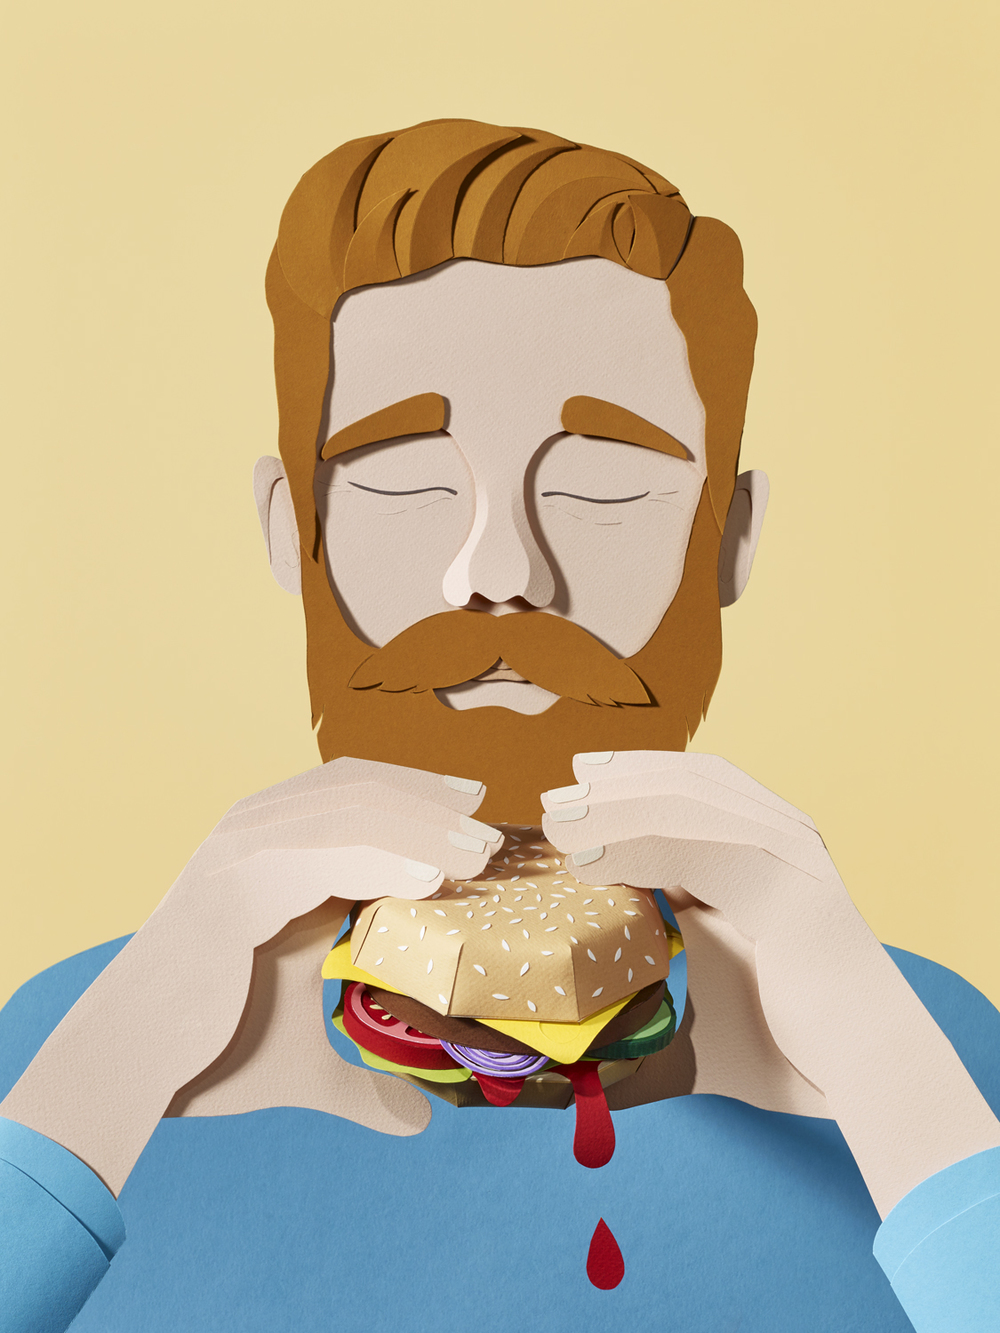 WRK_Graphicdesign_Tactile_Illustration_Burgerista_Burgerman_Andrea_Weber_Damoun_Tamir.jpg